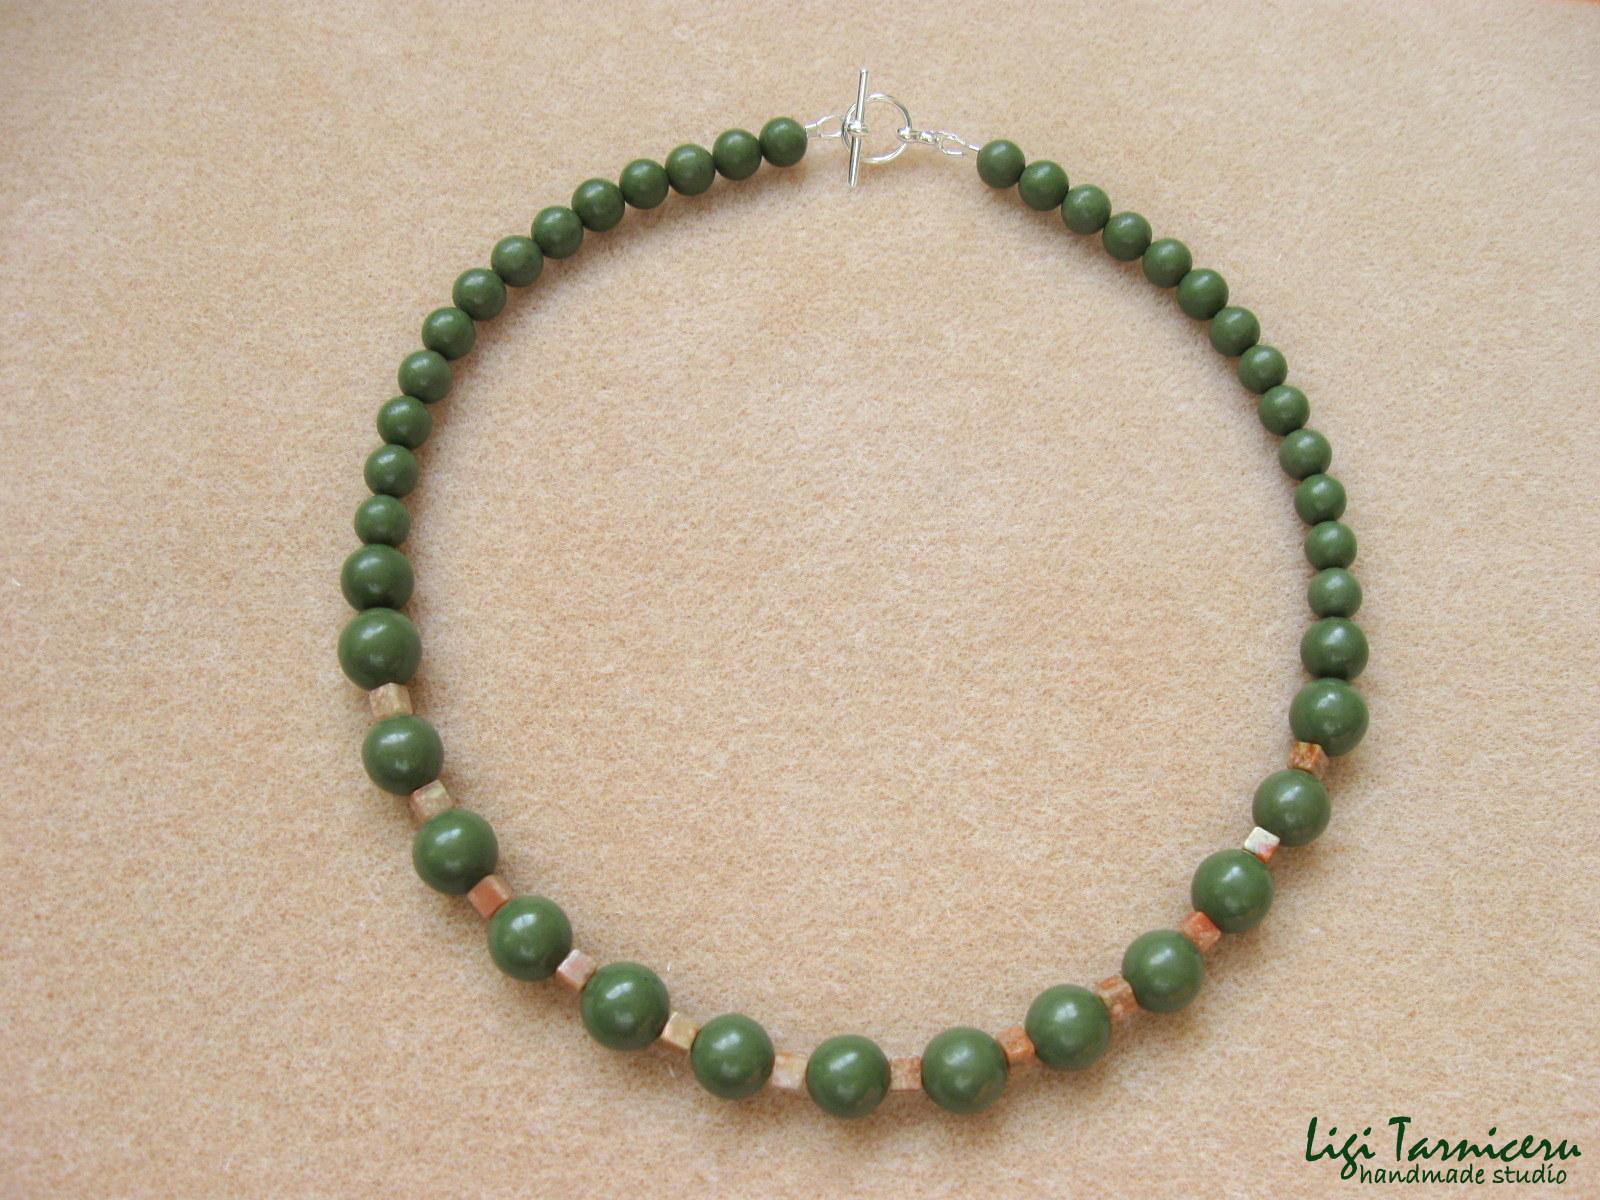 Green jasper, autumn jasper and sterling silver - necklace